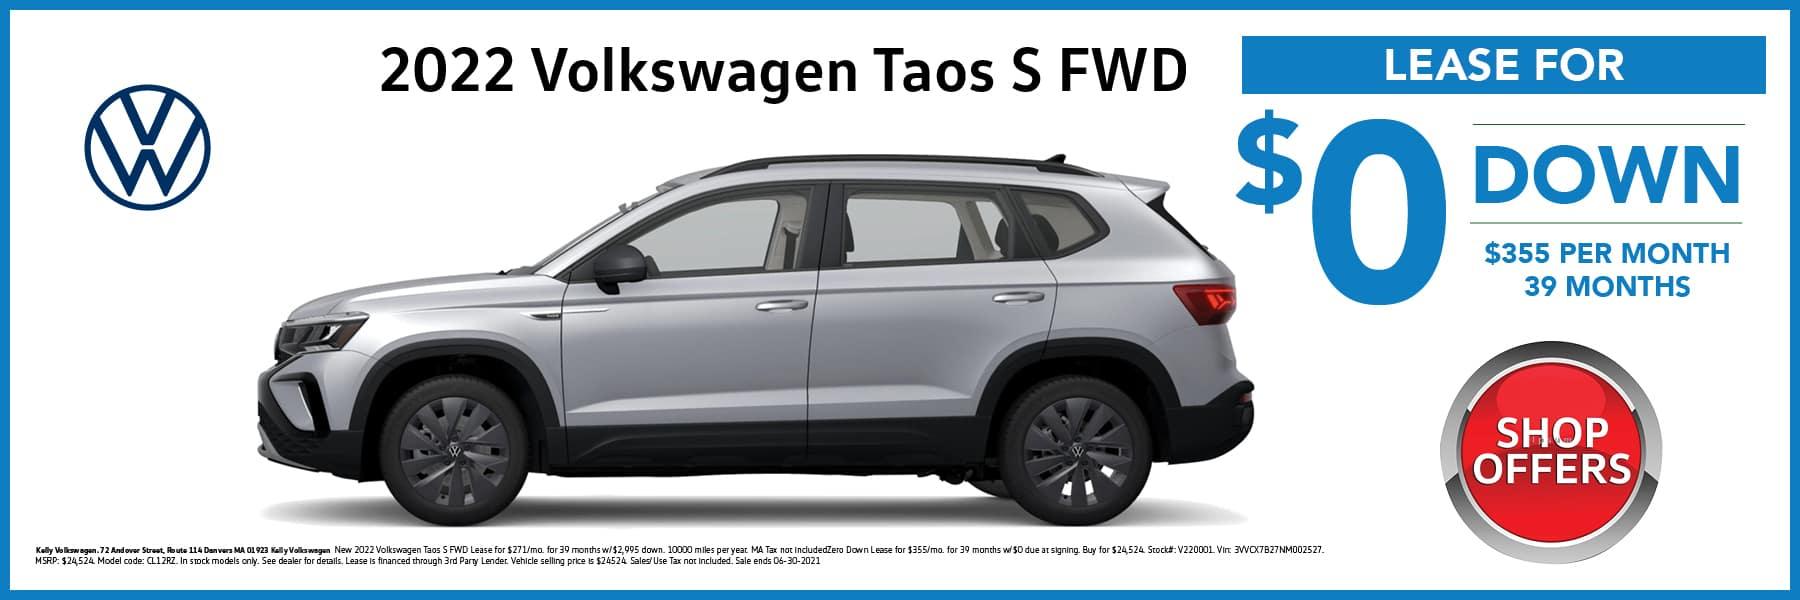 2022 Volkswagen Taos SUV in Silver Lease Offer Web Slide